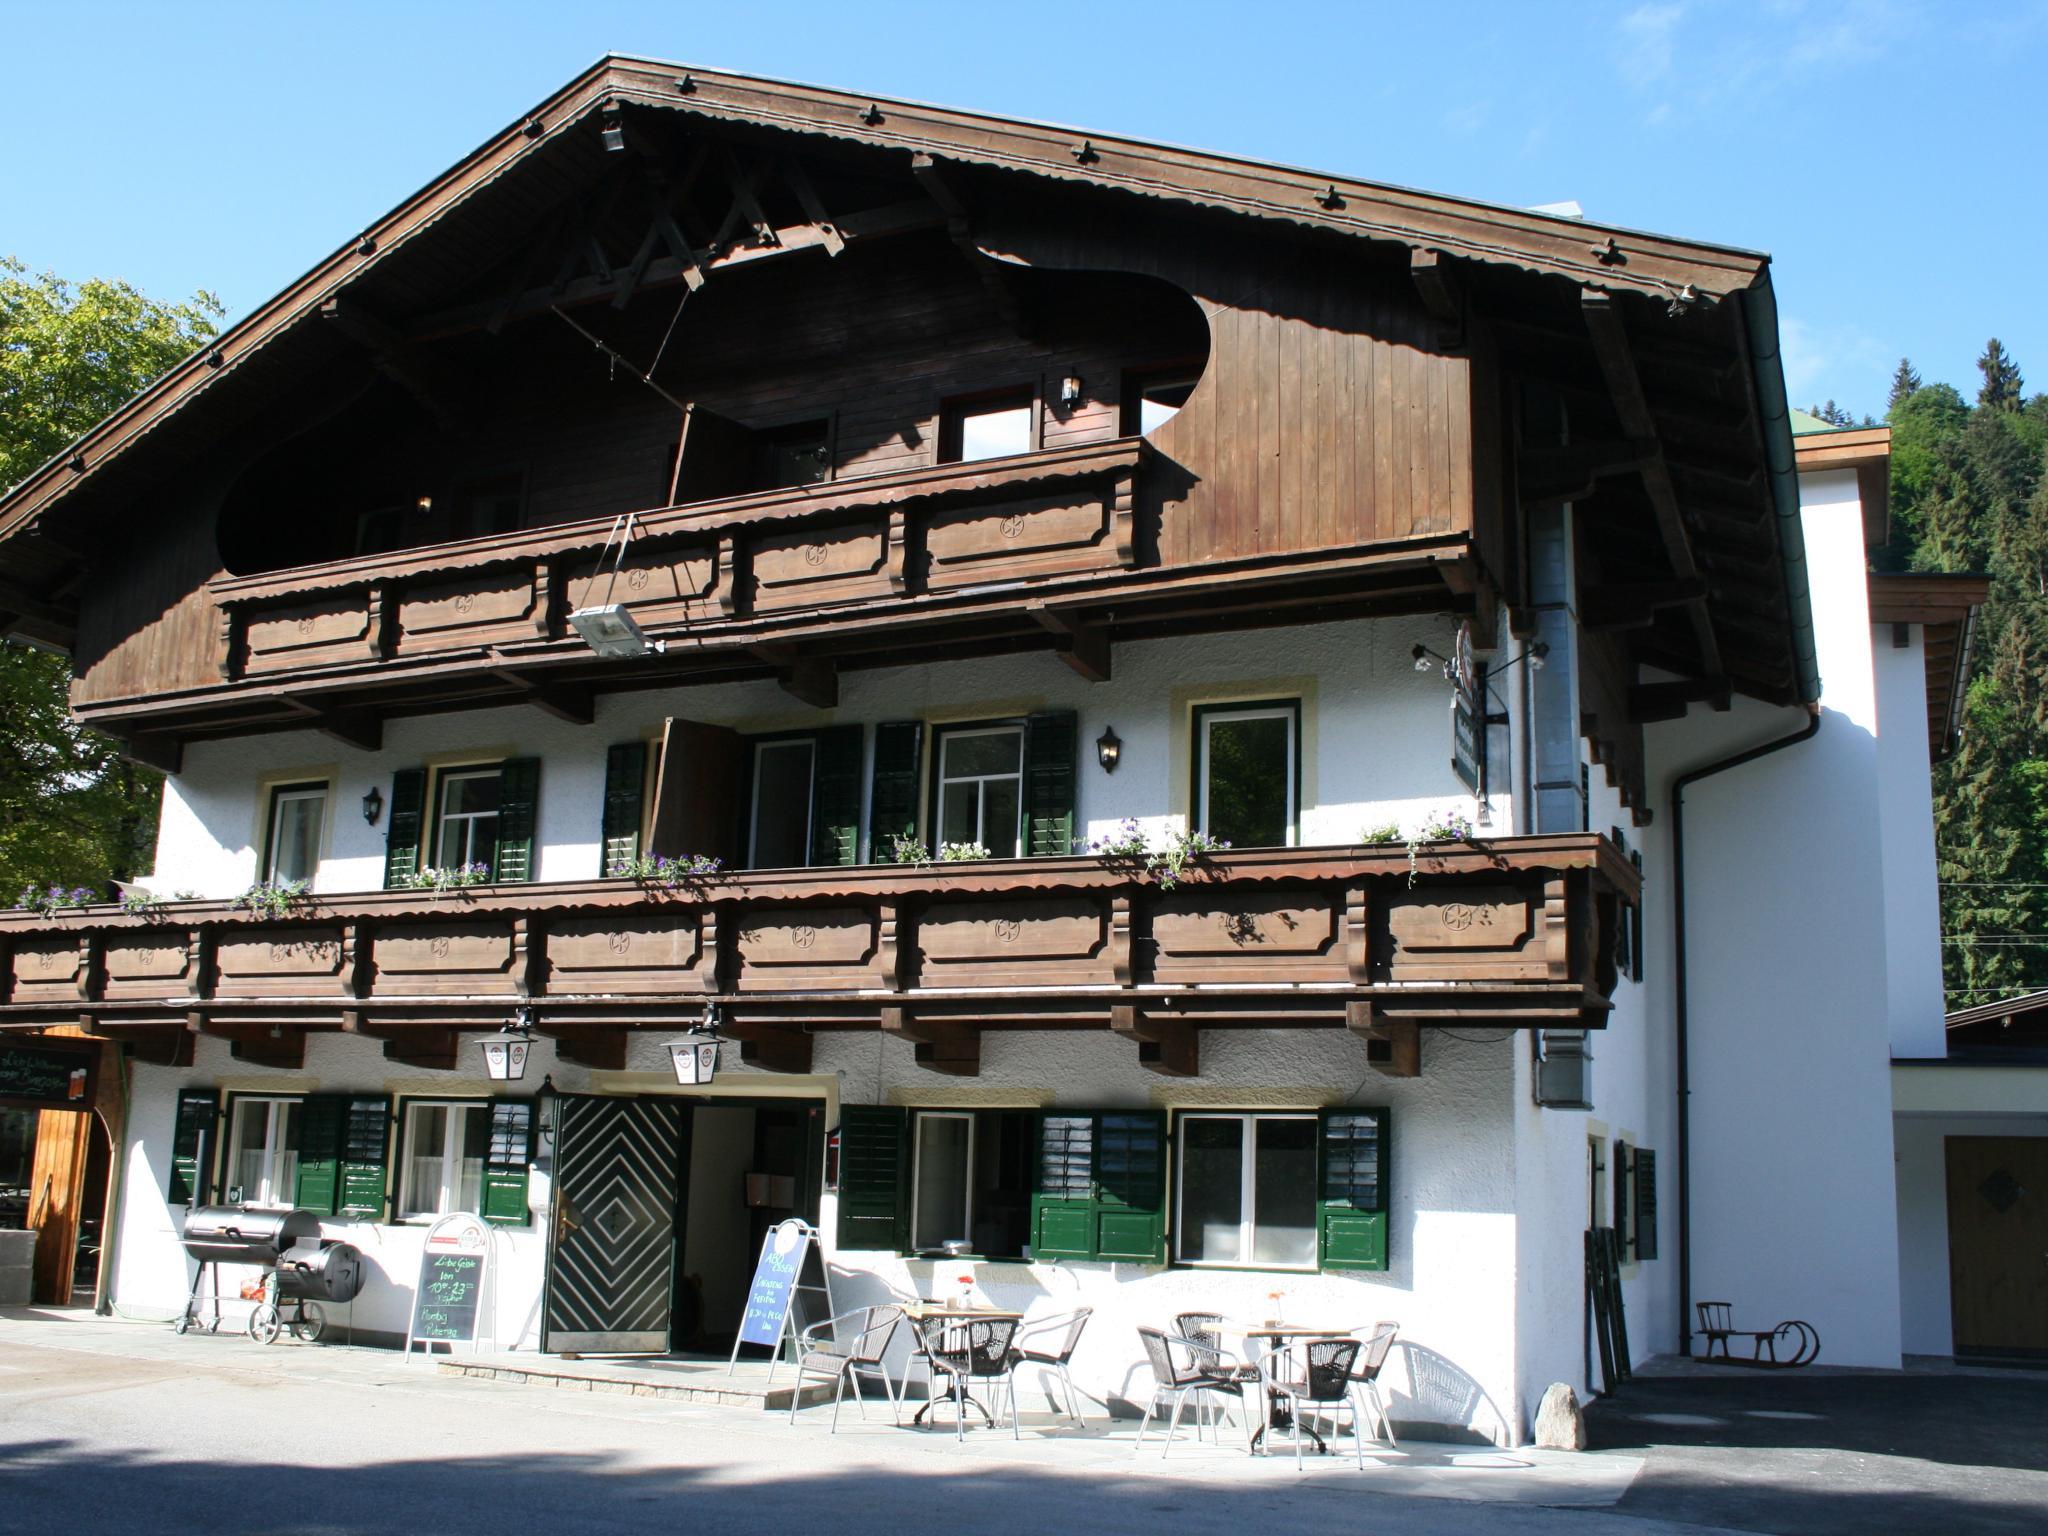 Grieswirt Tirol XL Tirol